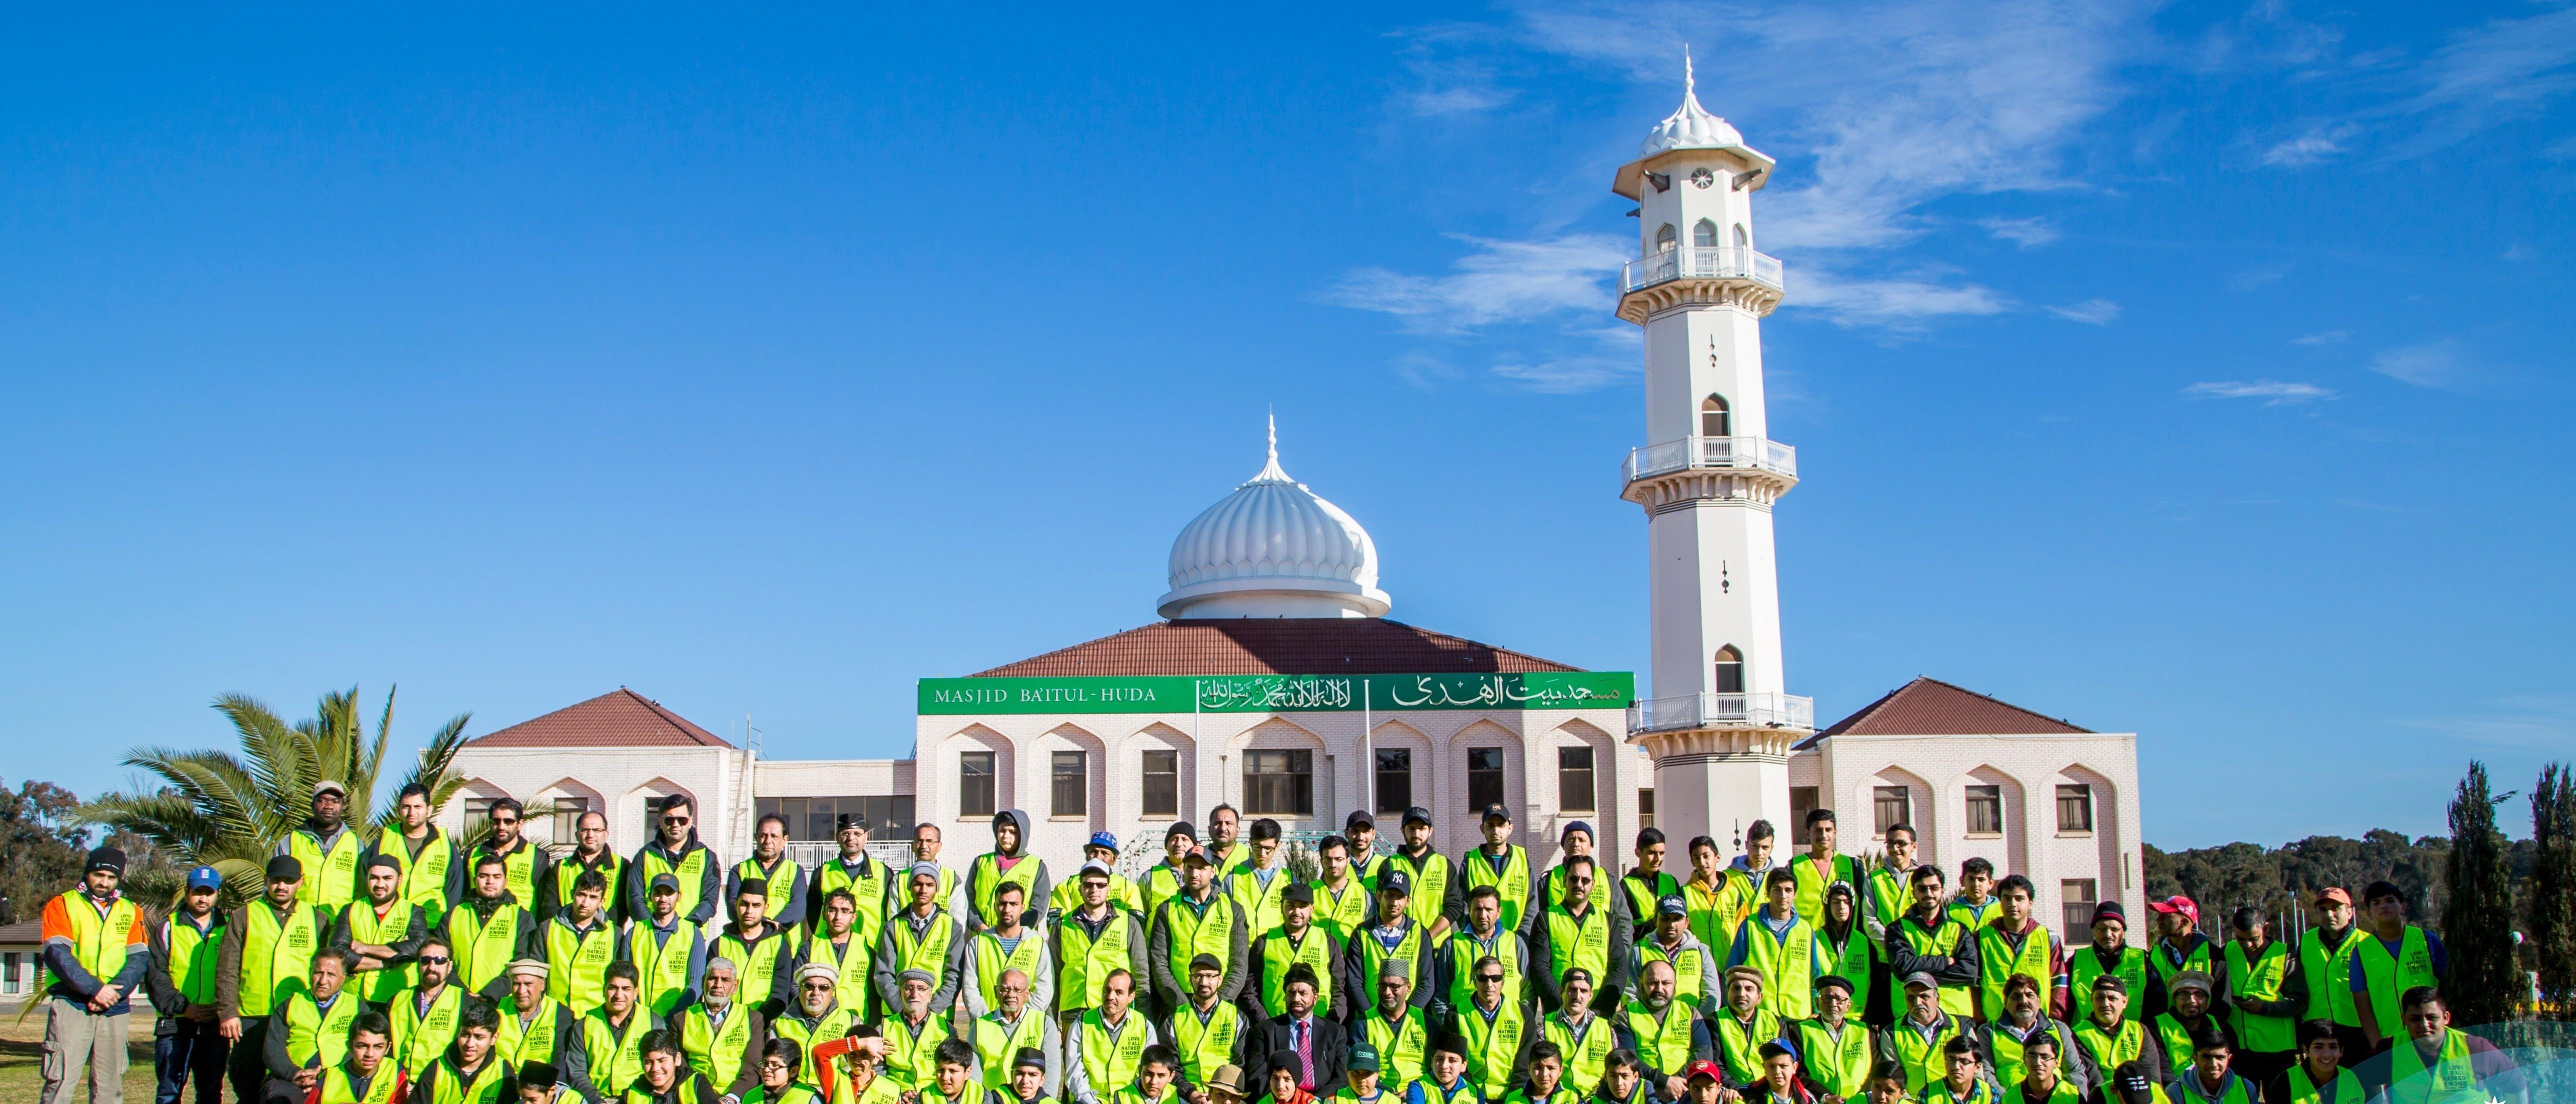 Ahmadi Muslims NSW - Baitul Huda Mosque (HeadQuarters)